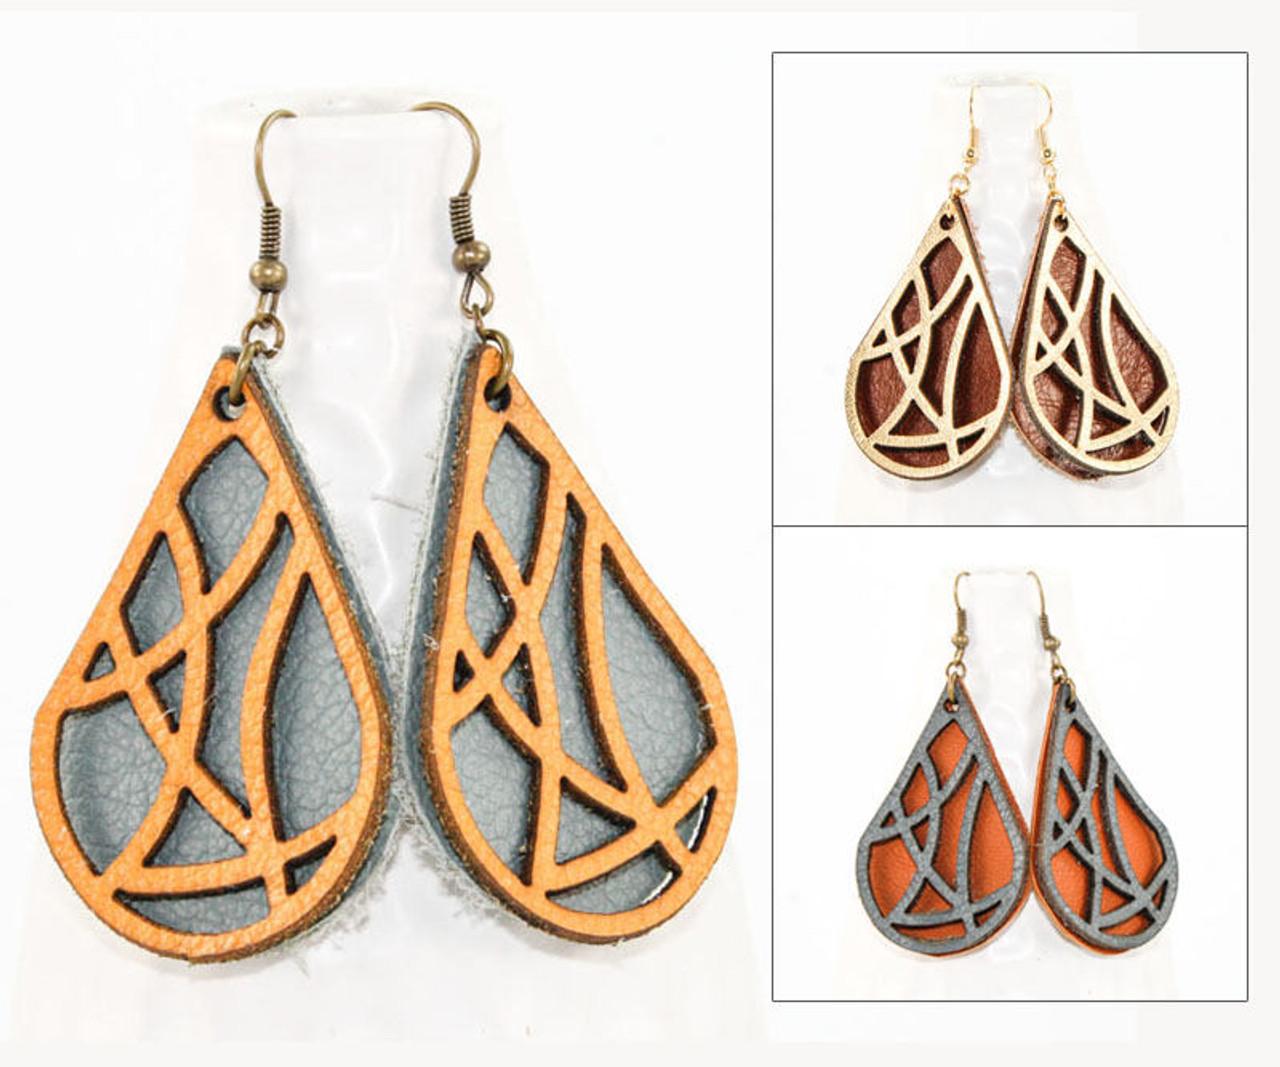 5f12f0c4e Leather Earrings - Geometric Teardrop - Once Again Sam